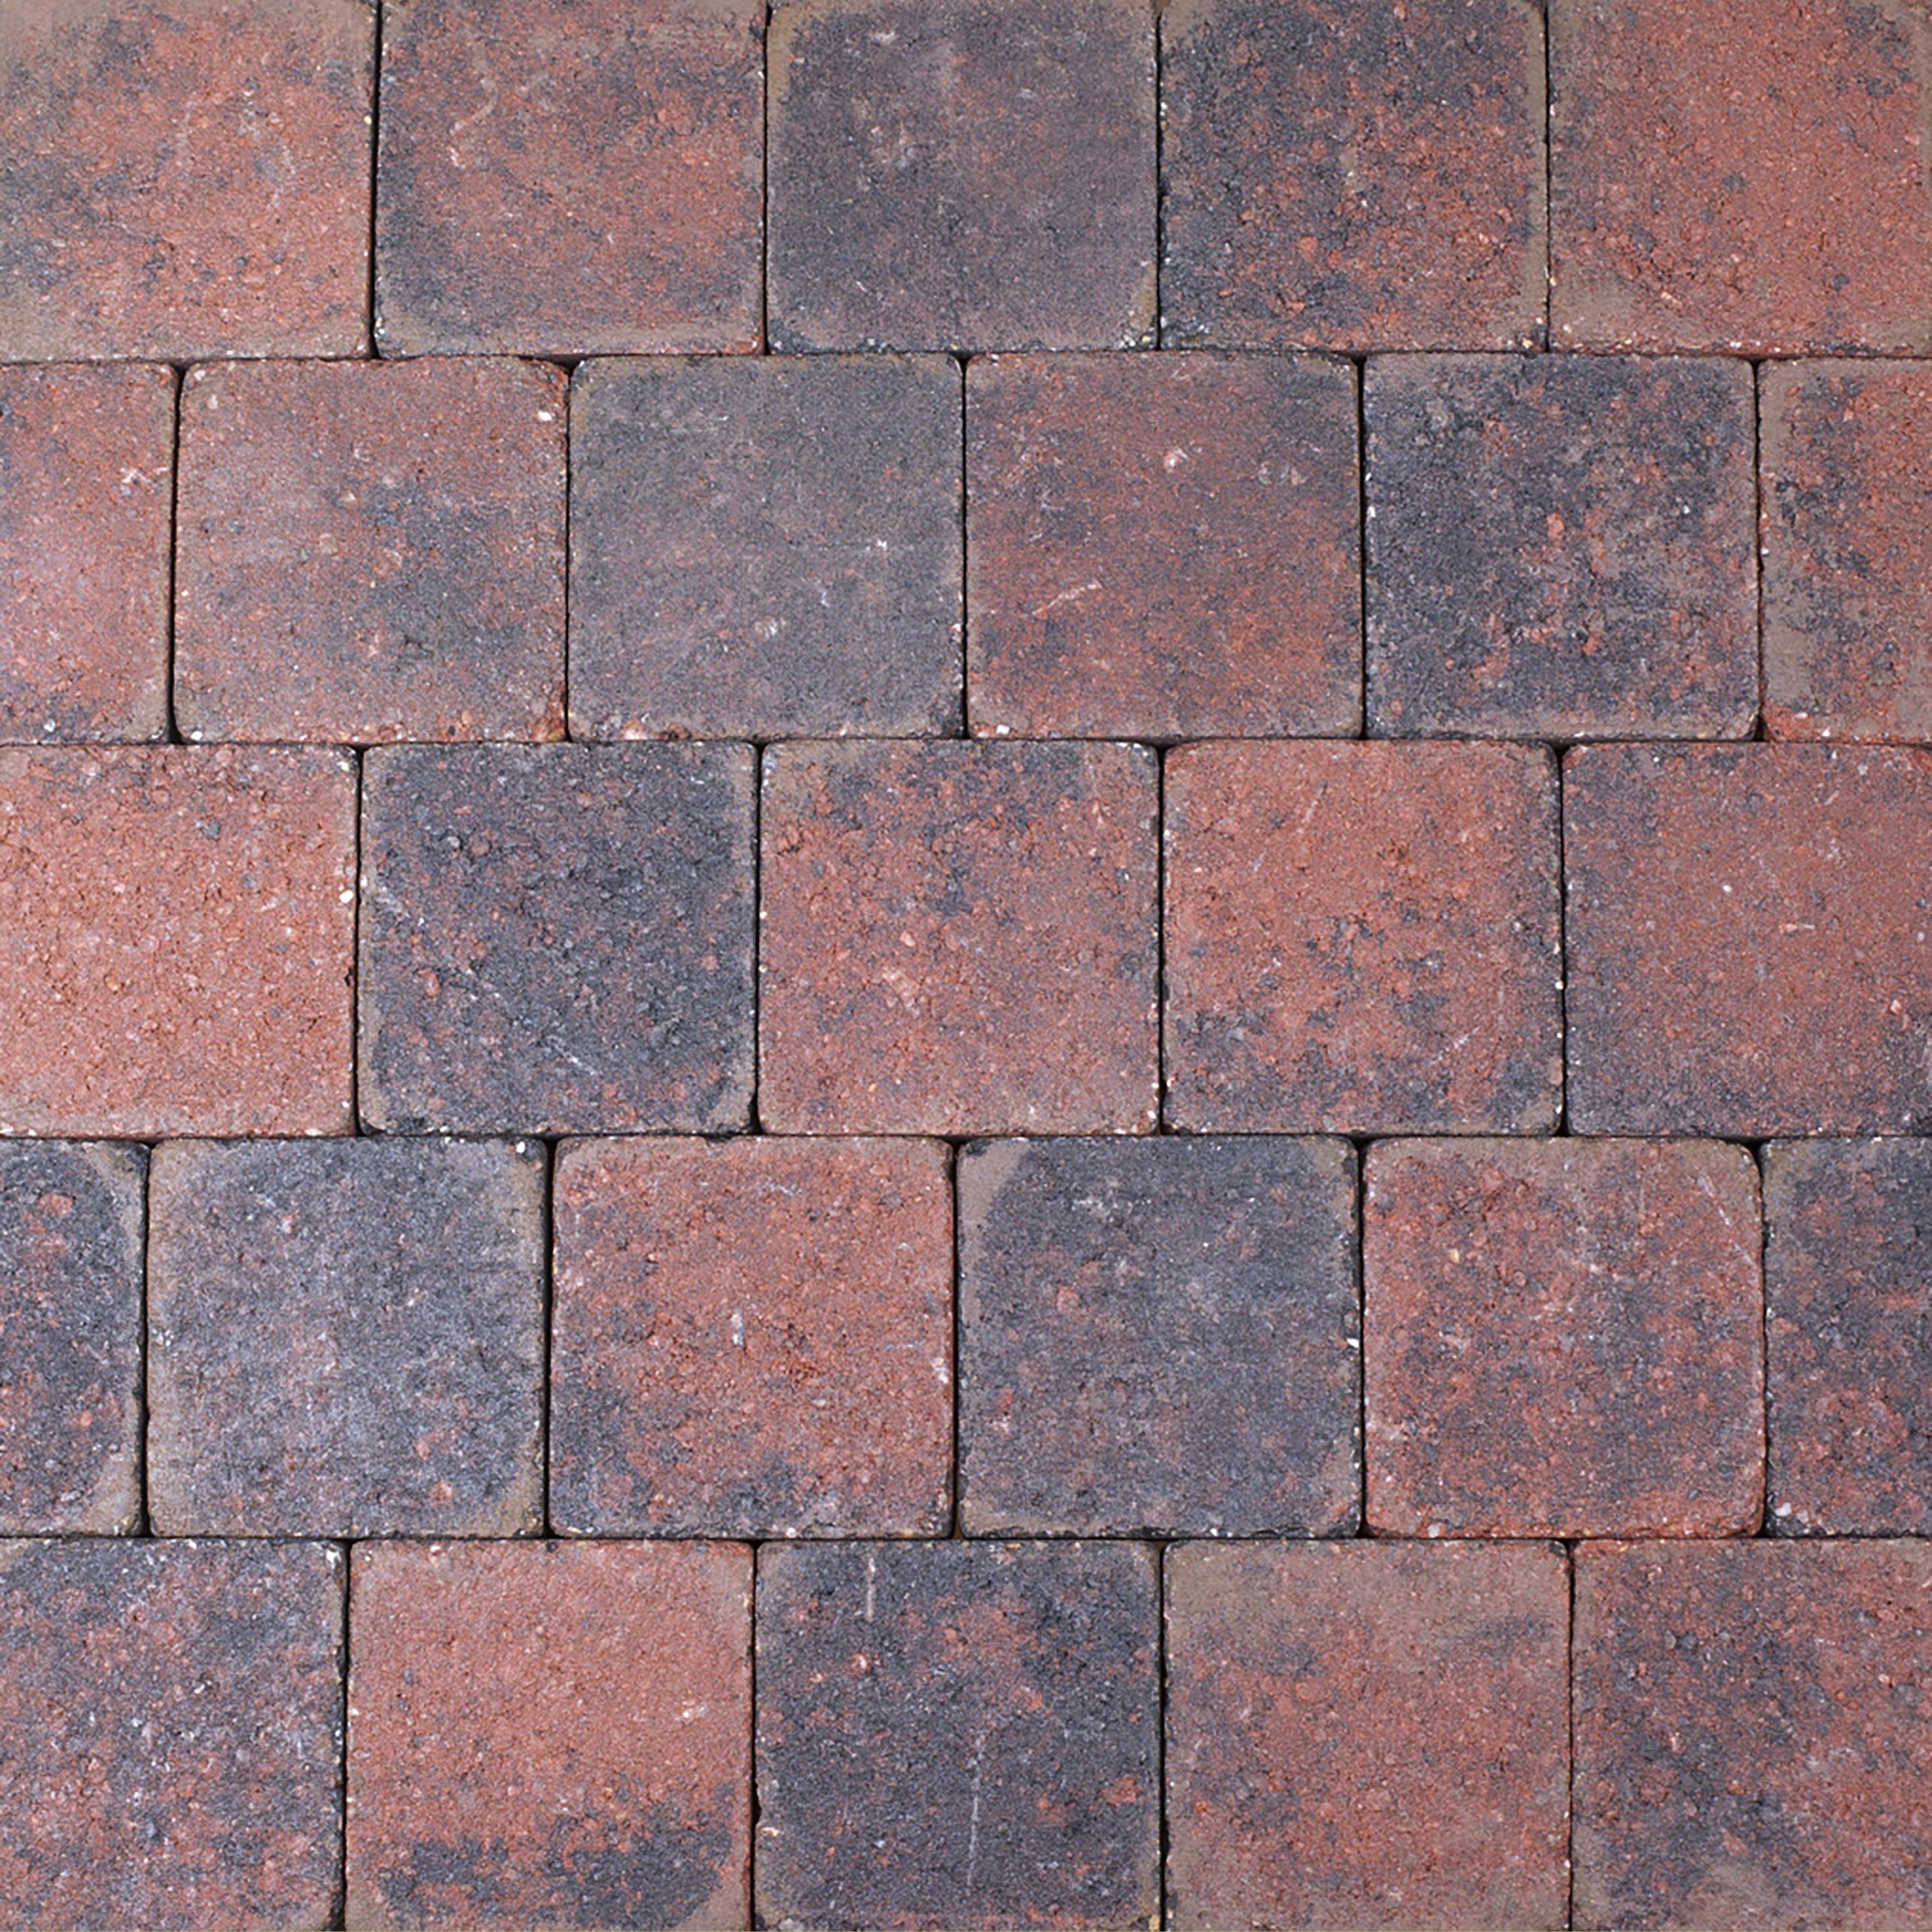 Trommelsteen Beton Rood/Zwart 14x14x7 cm - 315 Stuks - 6,18 m2